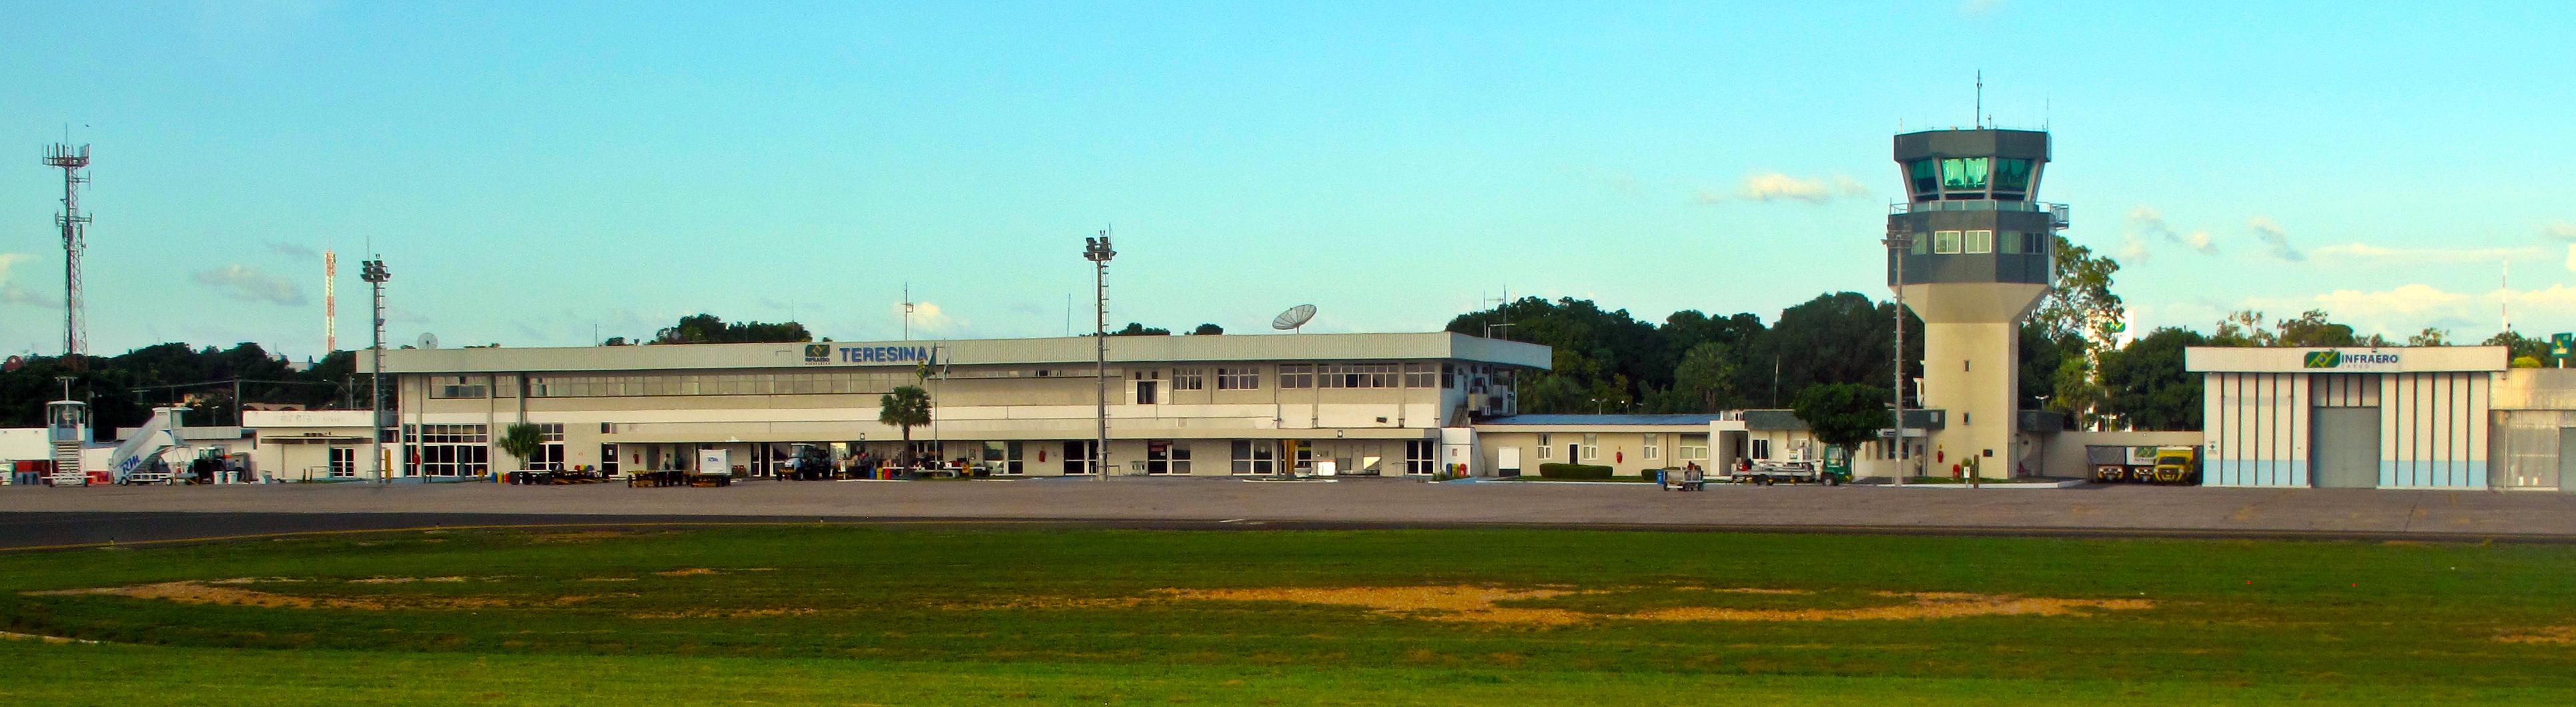 6baa6e239 Aeroporto Senador Petrônio Portella em Teresina.